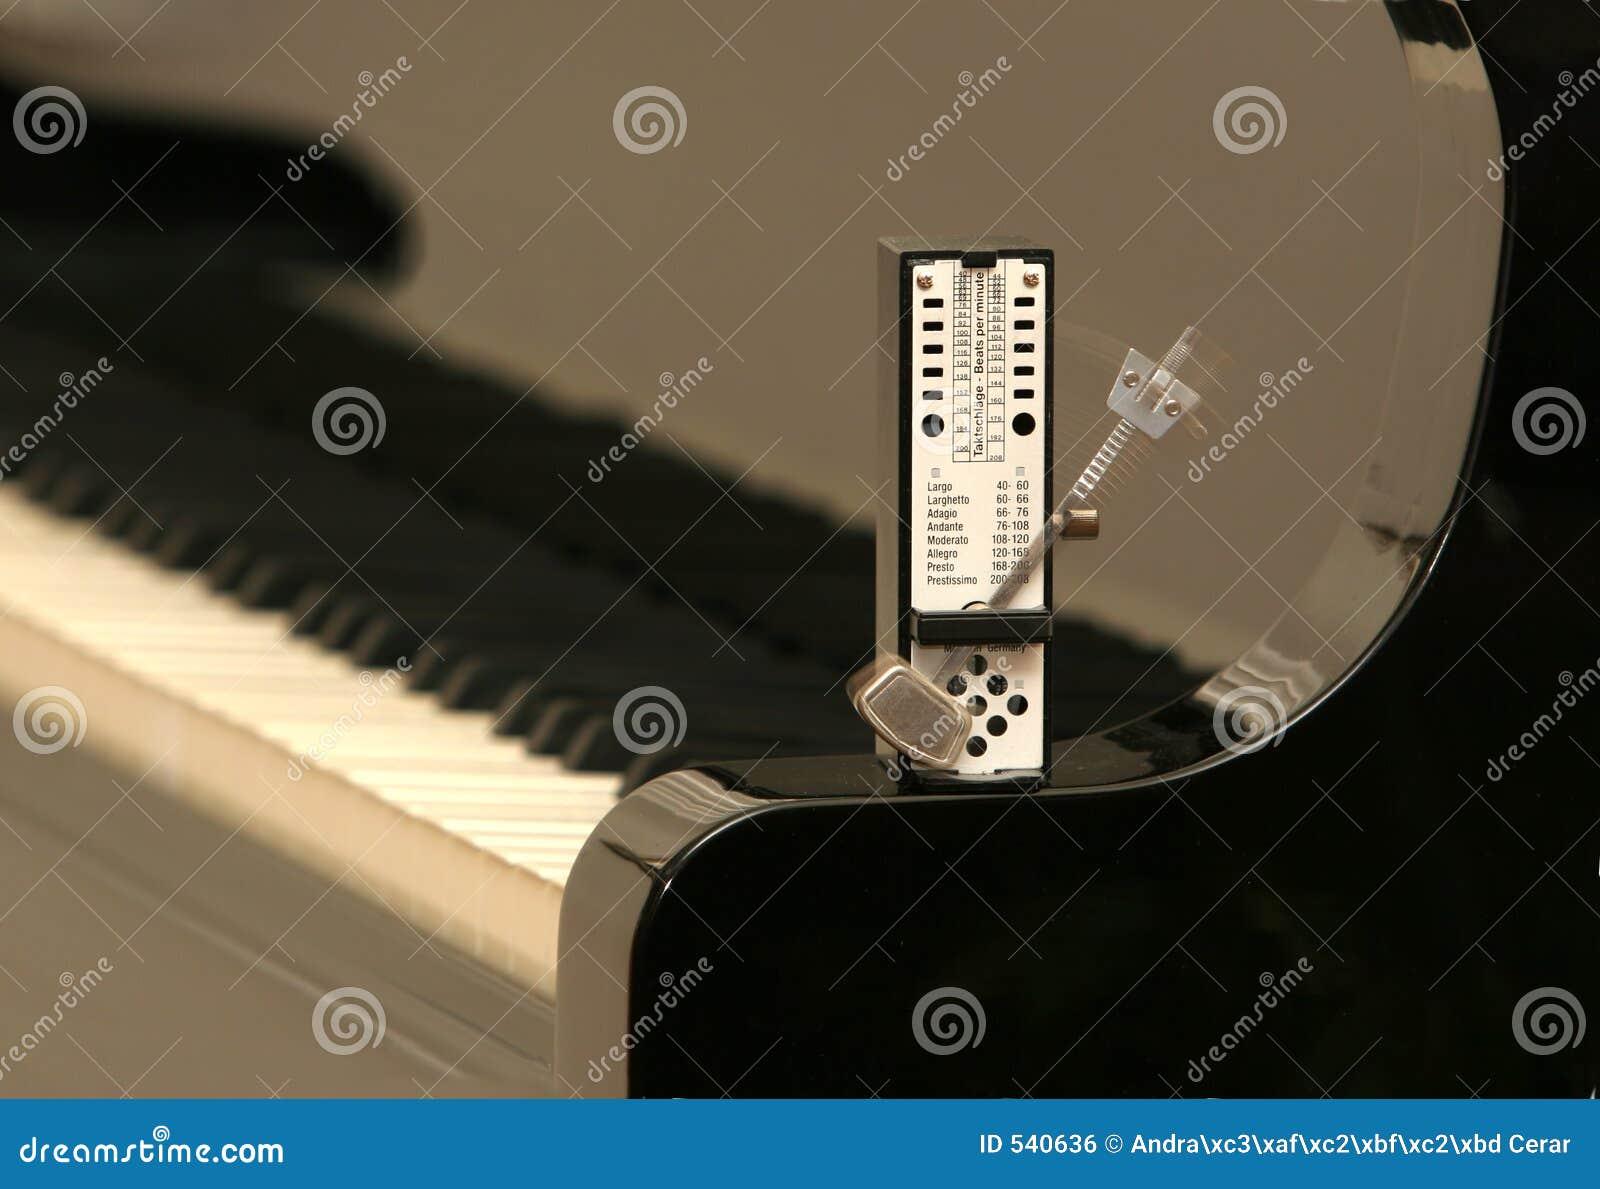 Download 节拍器钢琴 库存照片. 图片 包括有 确切, 课程, 抽象, 招待, 协调, 非典型, 作曲家, 仪器, 艺术 - 540636